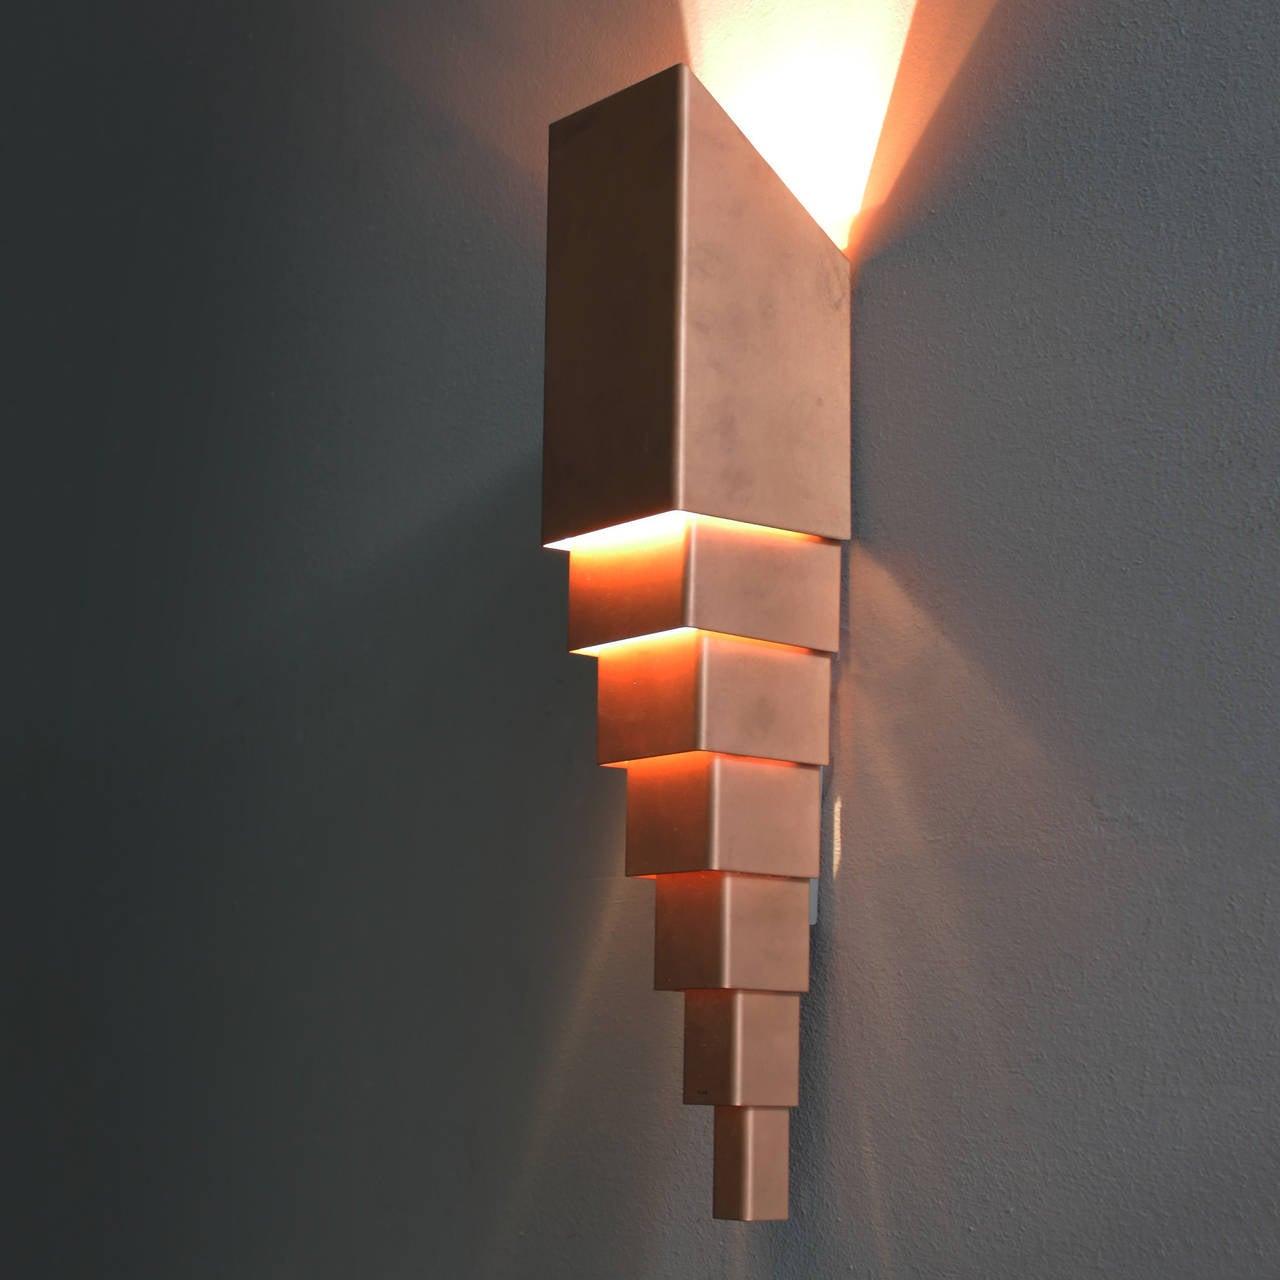 Pair of Scandinavian Architectural Wall Lamps at 1stdibs